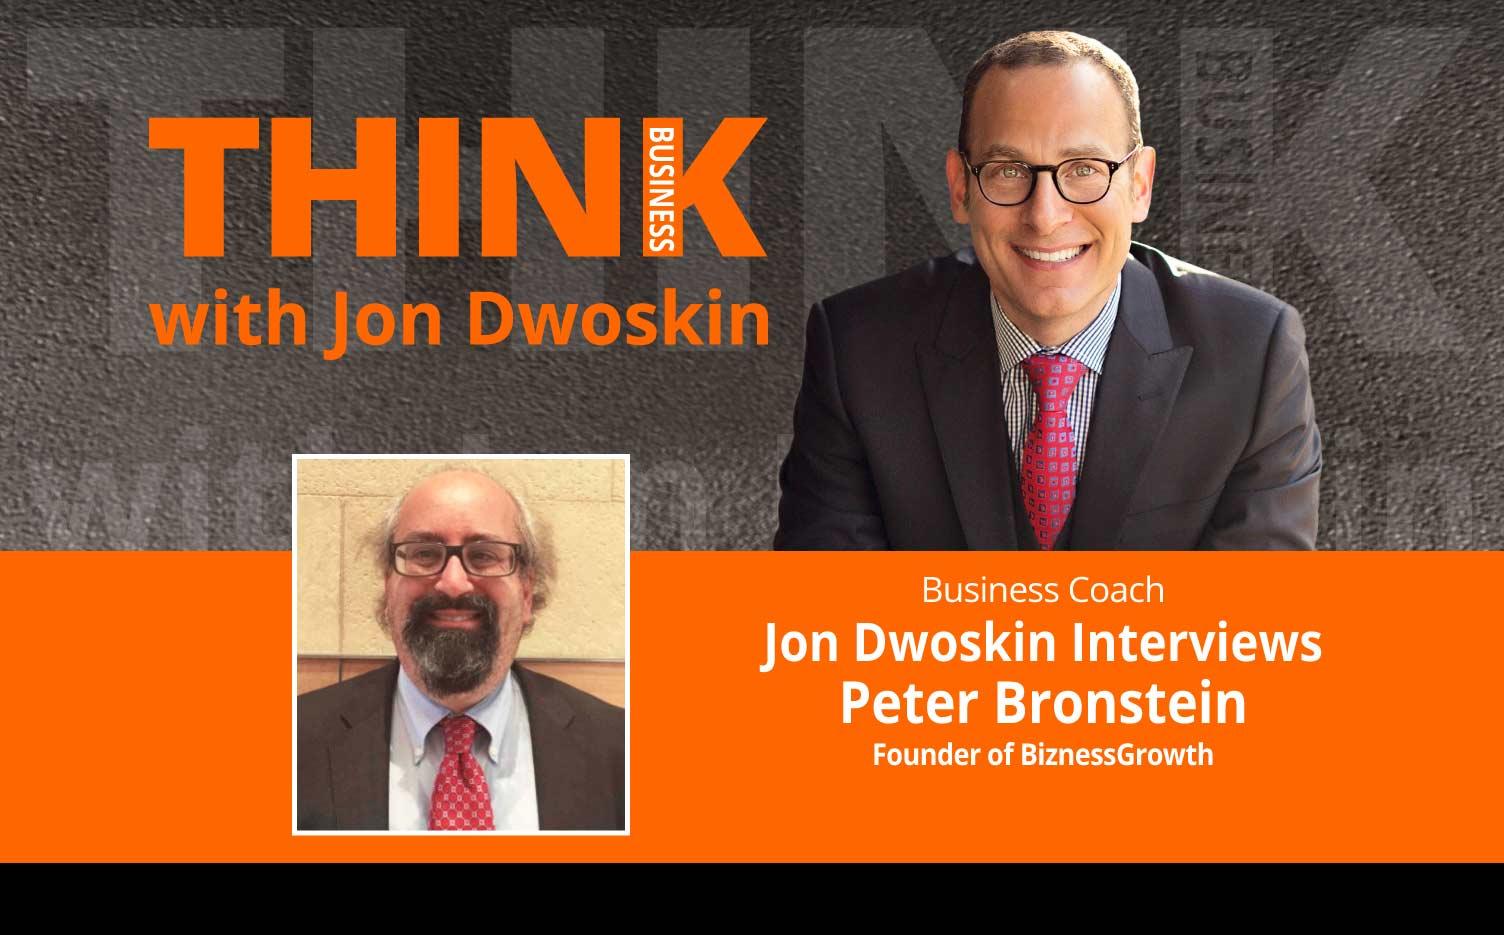 THINK Business Podcast: Jon Dwoskin Interviews Peter Bronstein, Founder of BiznessGrowth